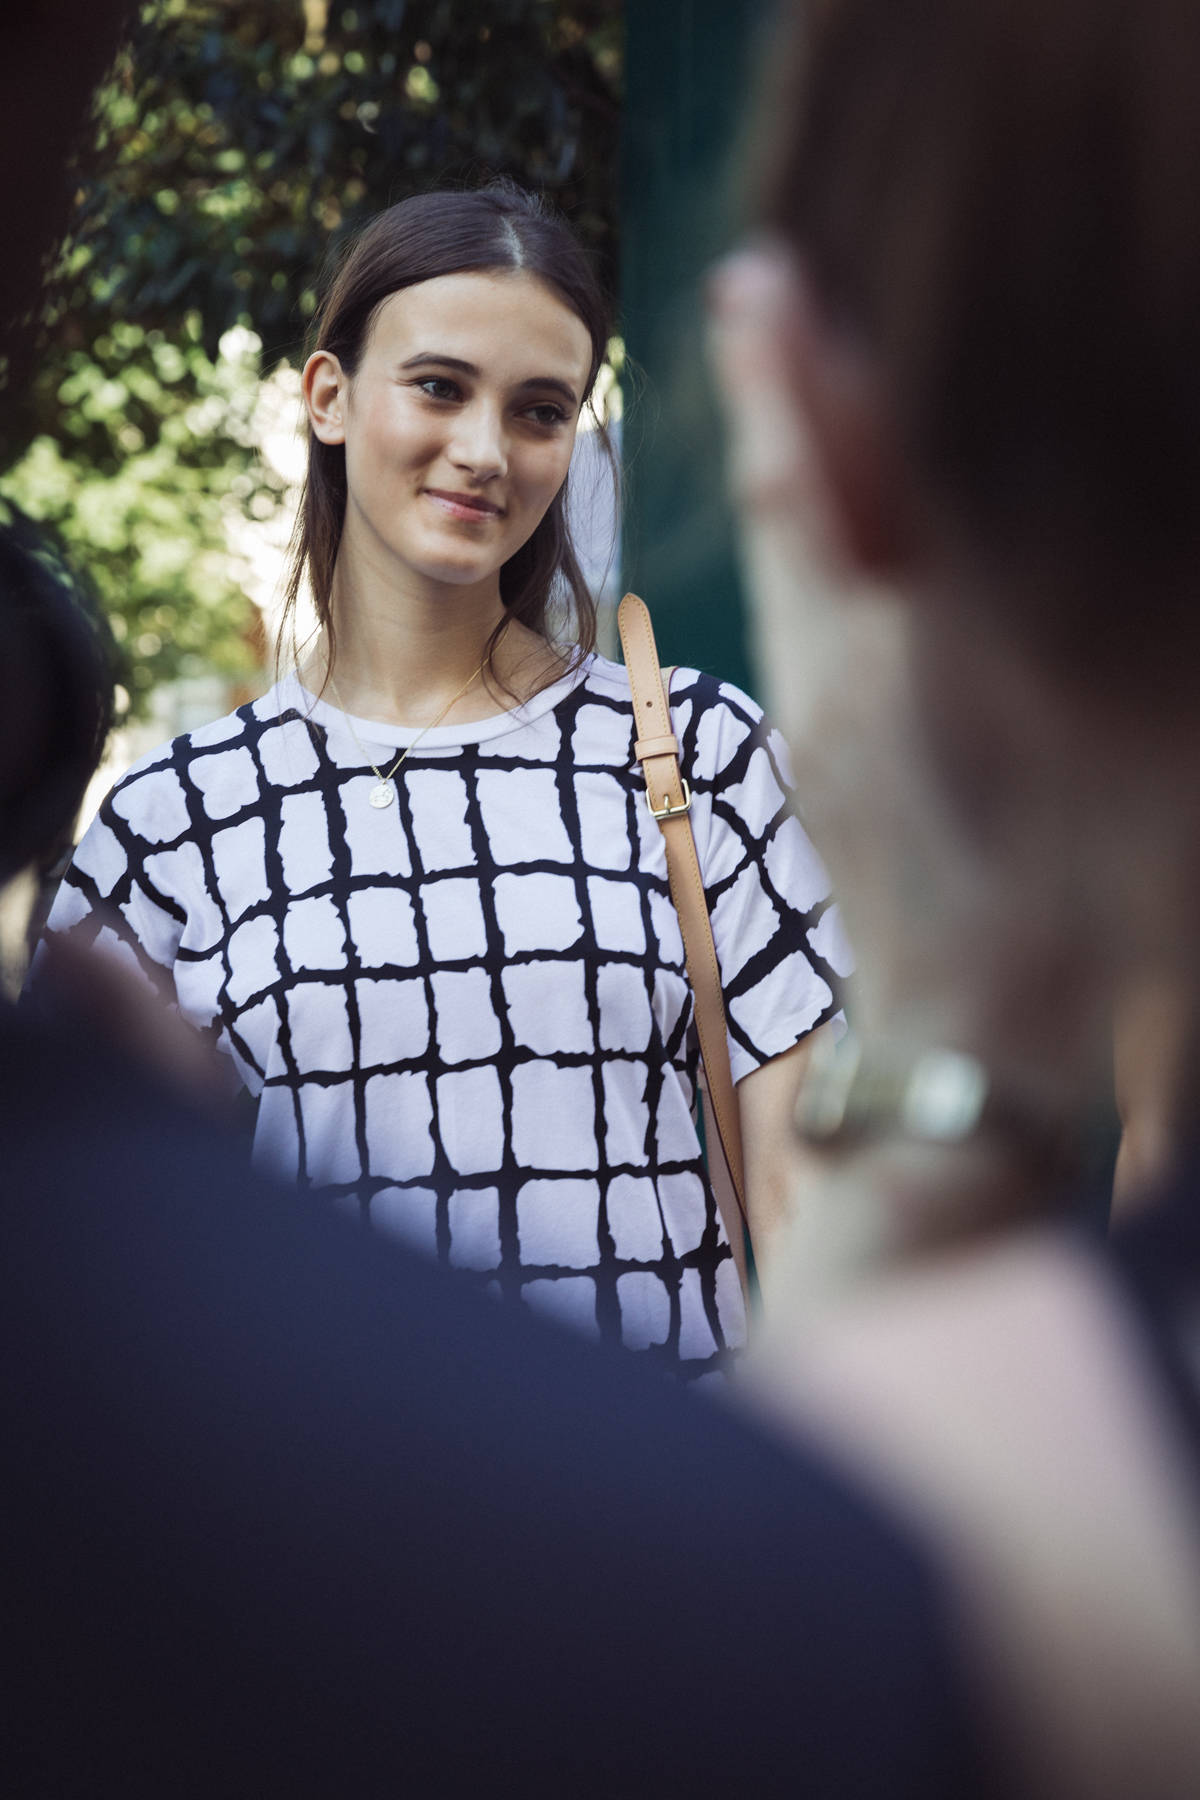 Zuhair-Murad-Paris-Fashion-Week-copyright-Alexis-Breugelmans-007.jpg